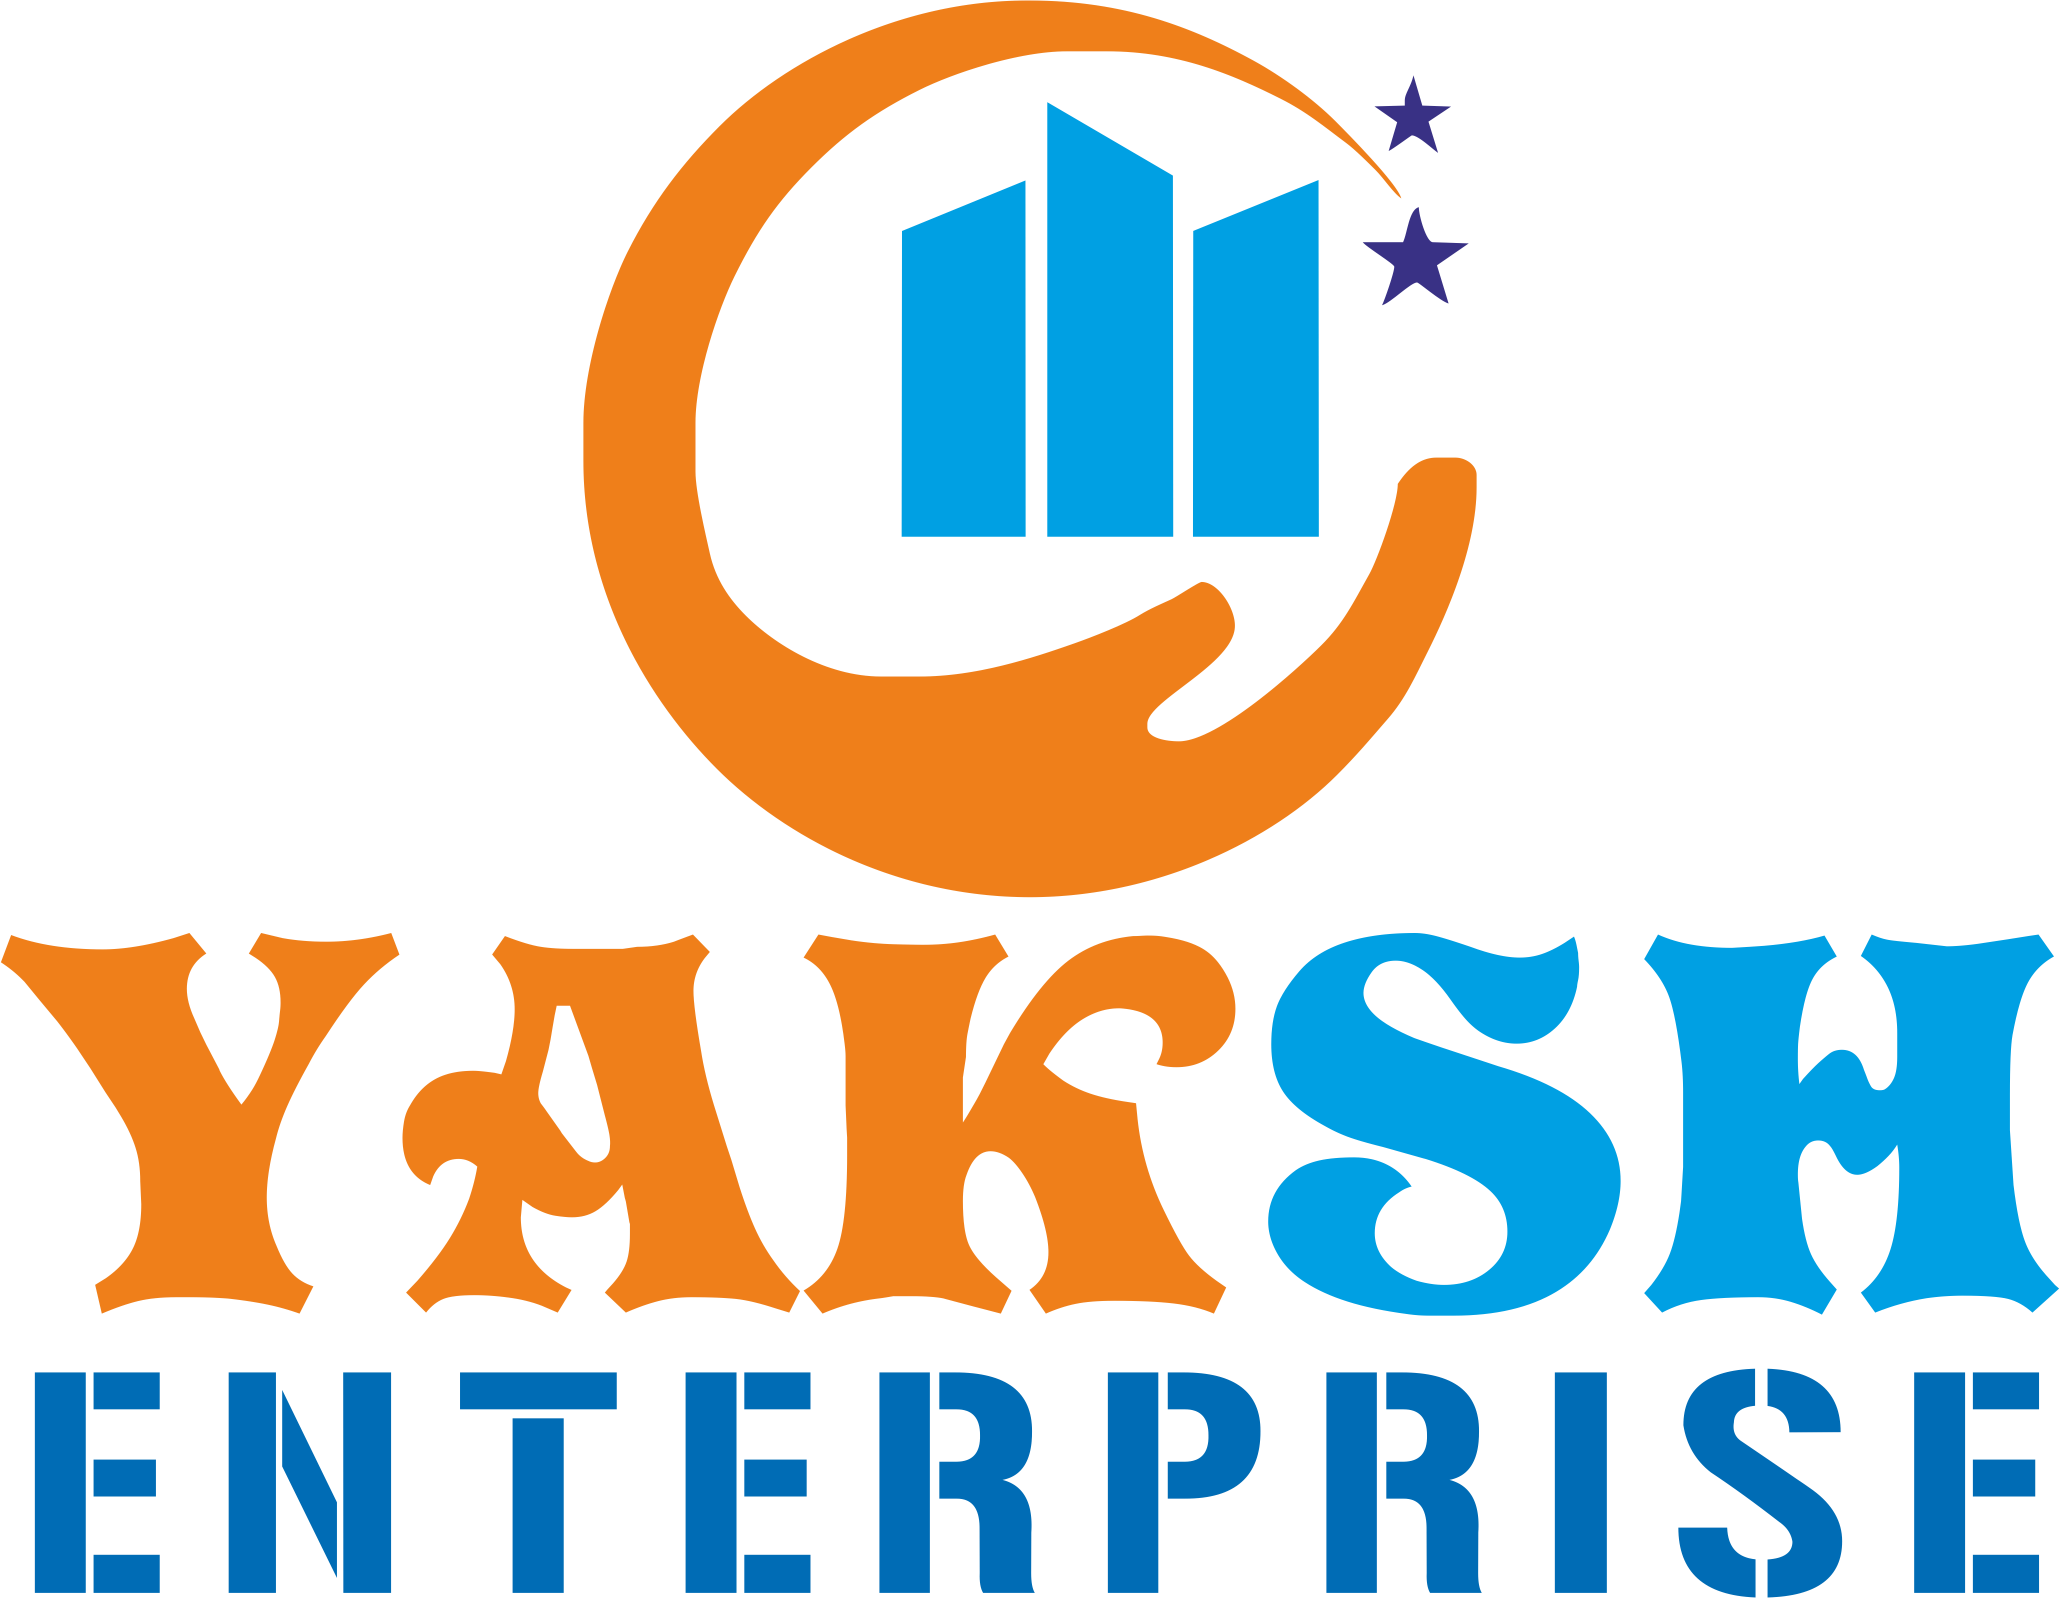 Yaksh Enterprise